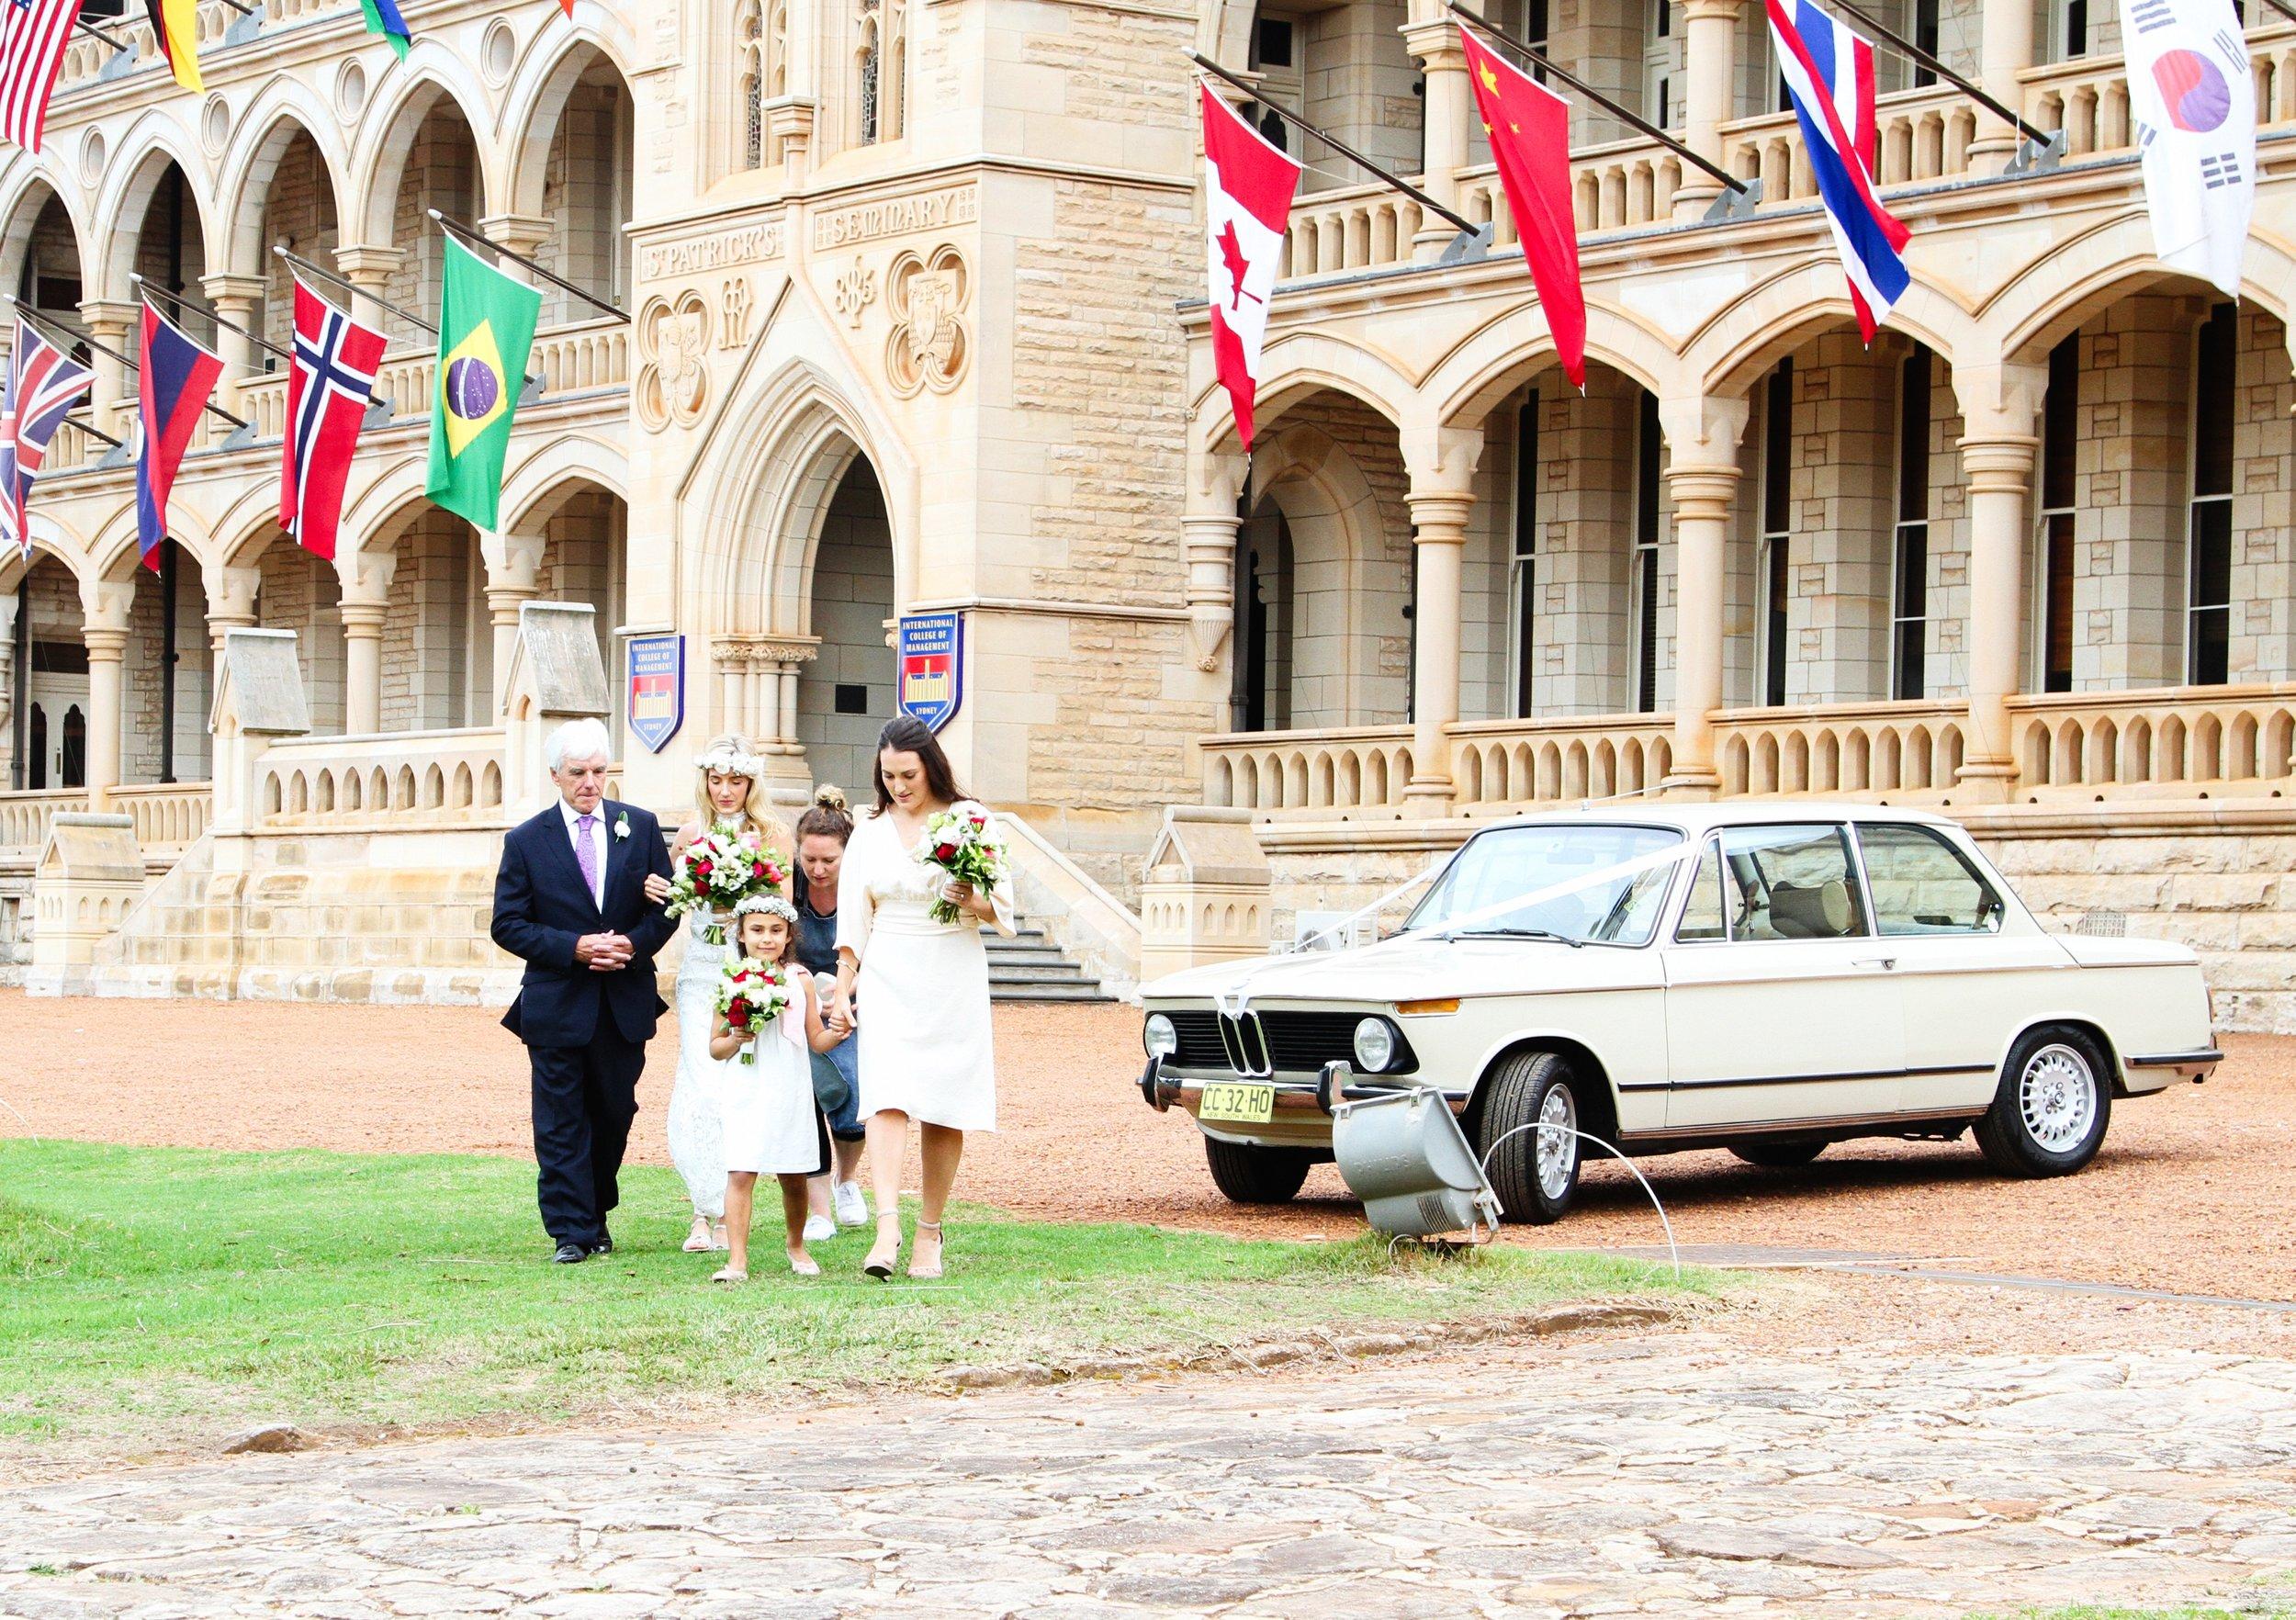 Family_wedding car shot.jpg